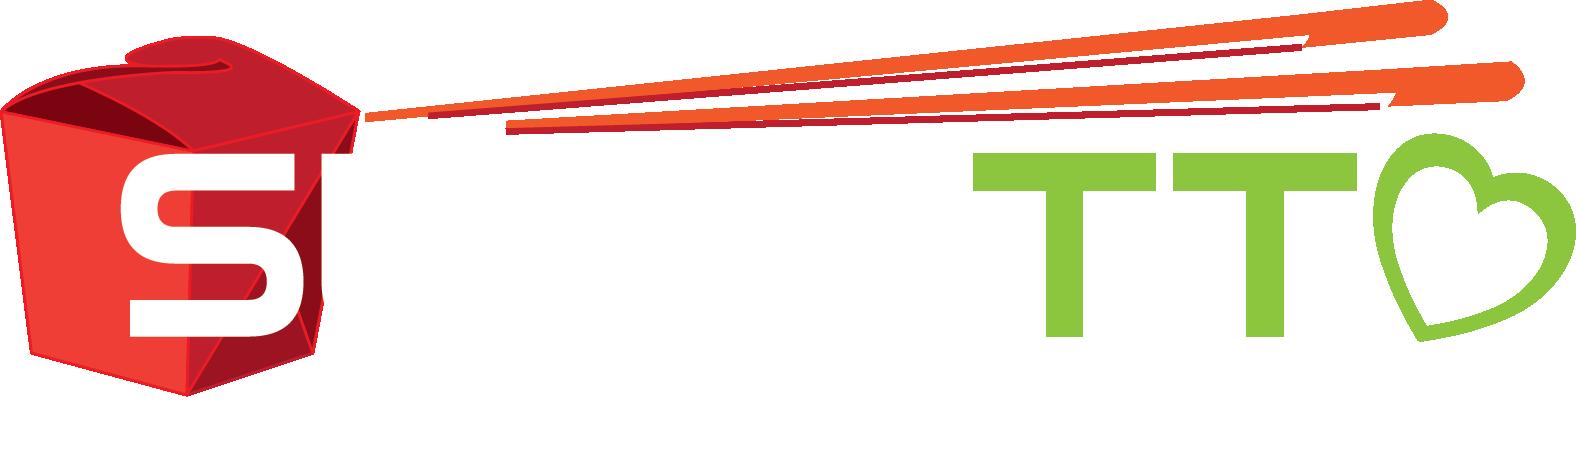 SUSHITTO